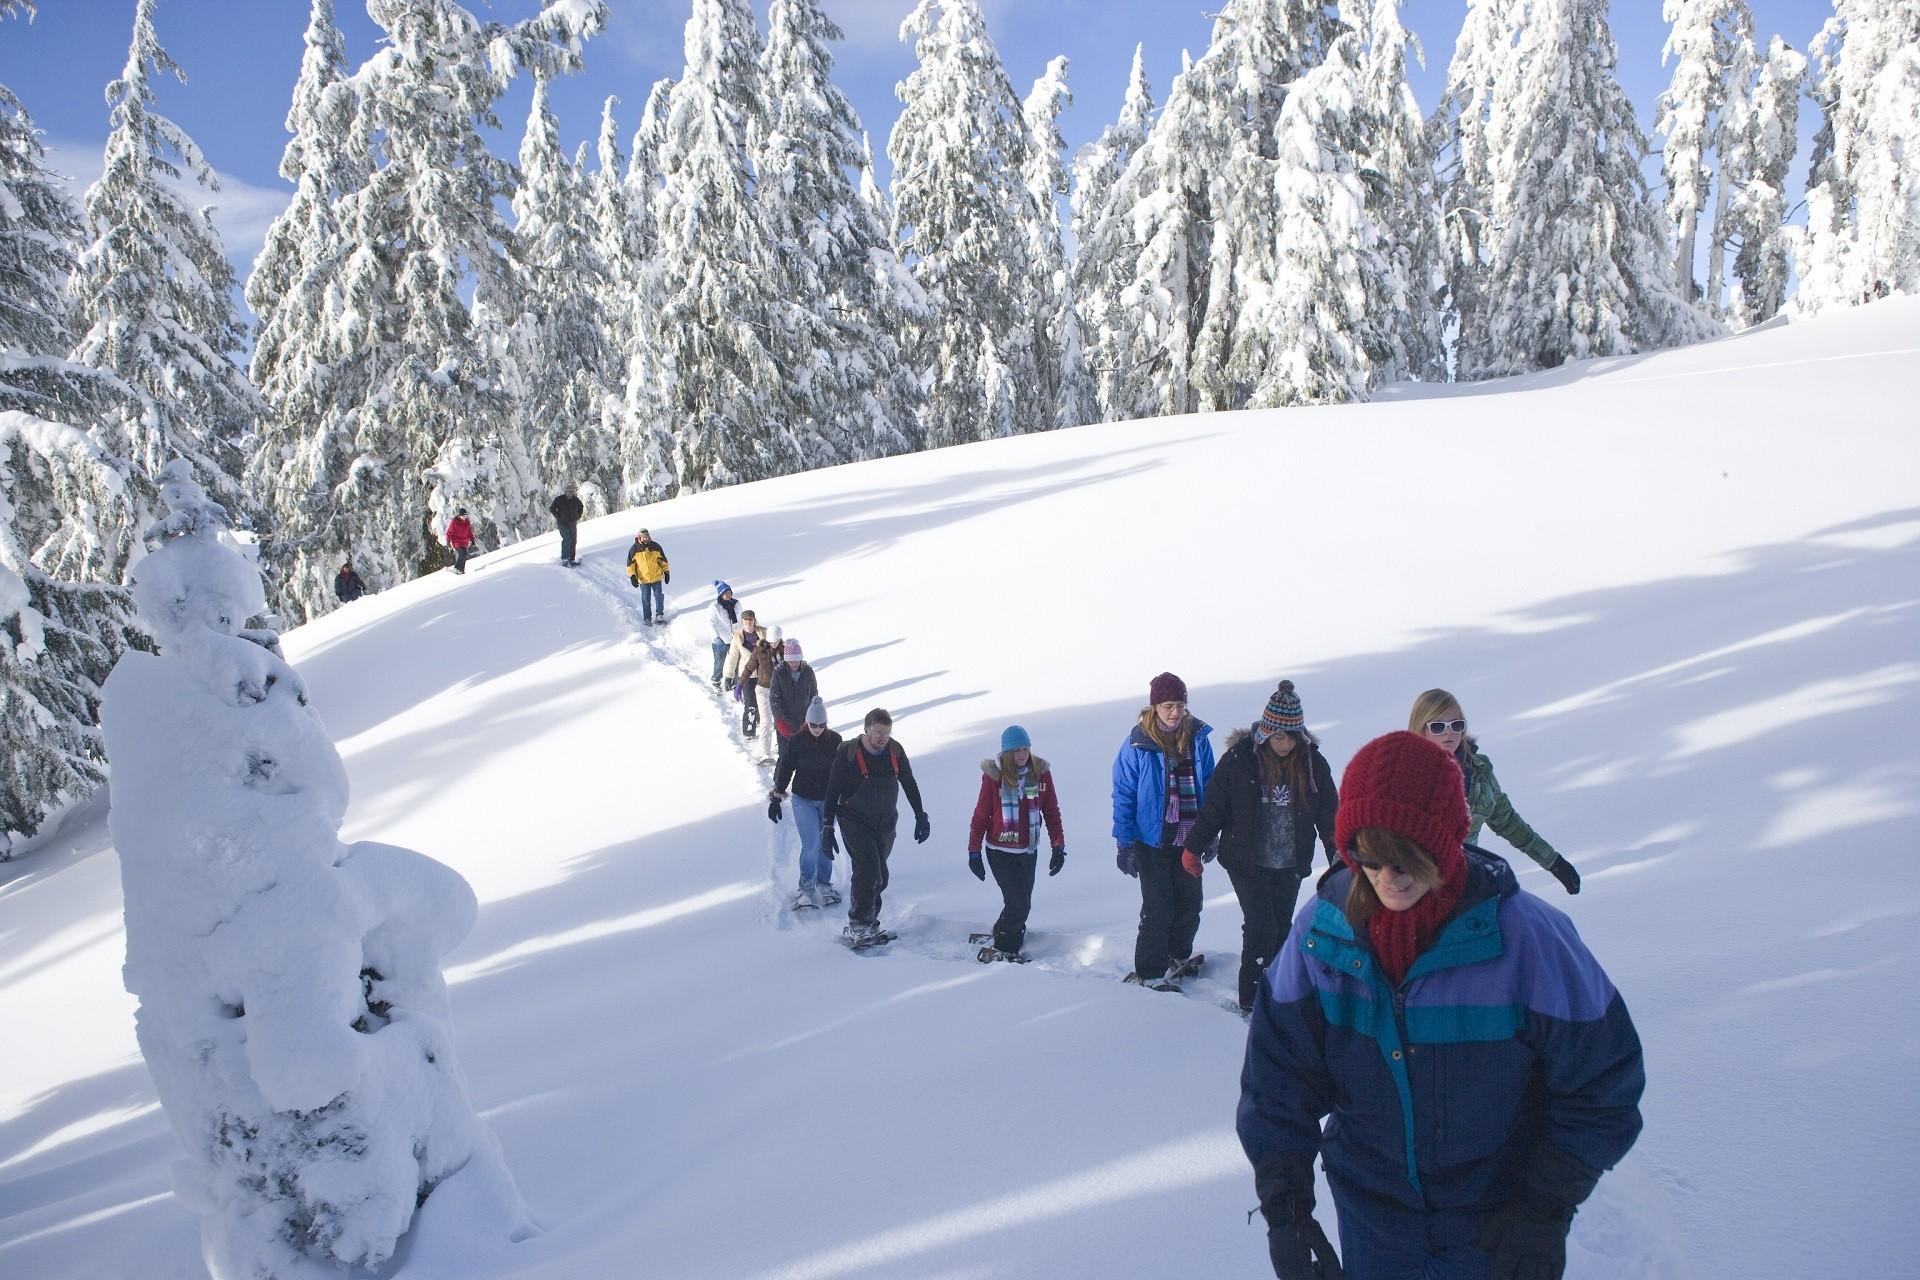 Begeleide sneeuwschoentochten